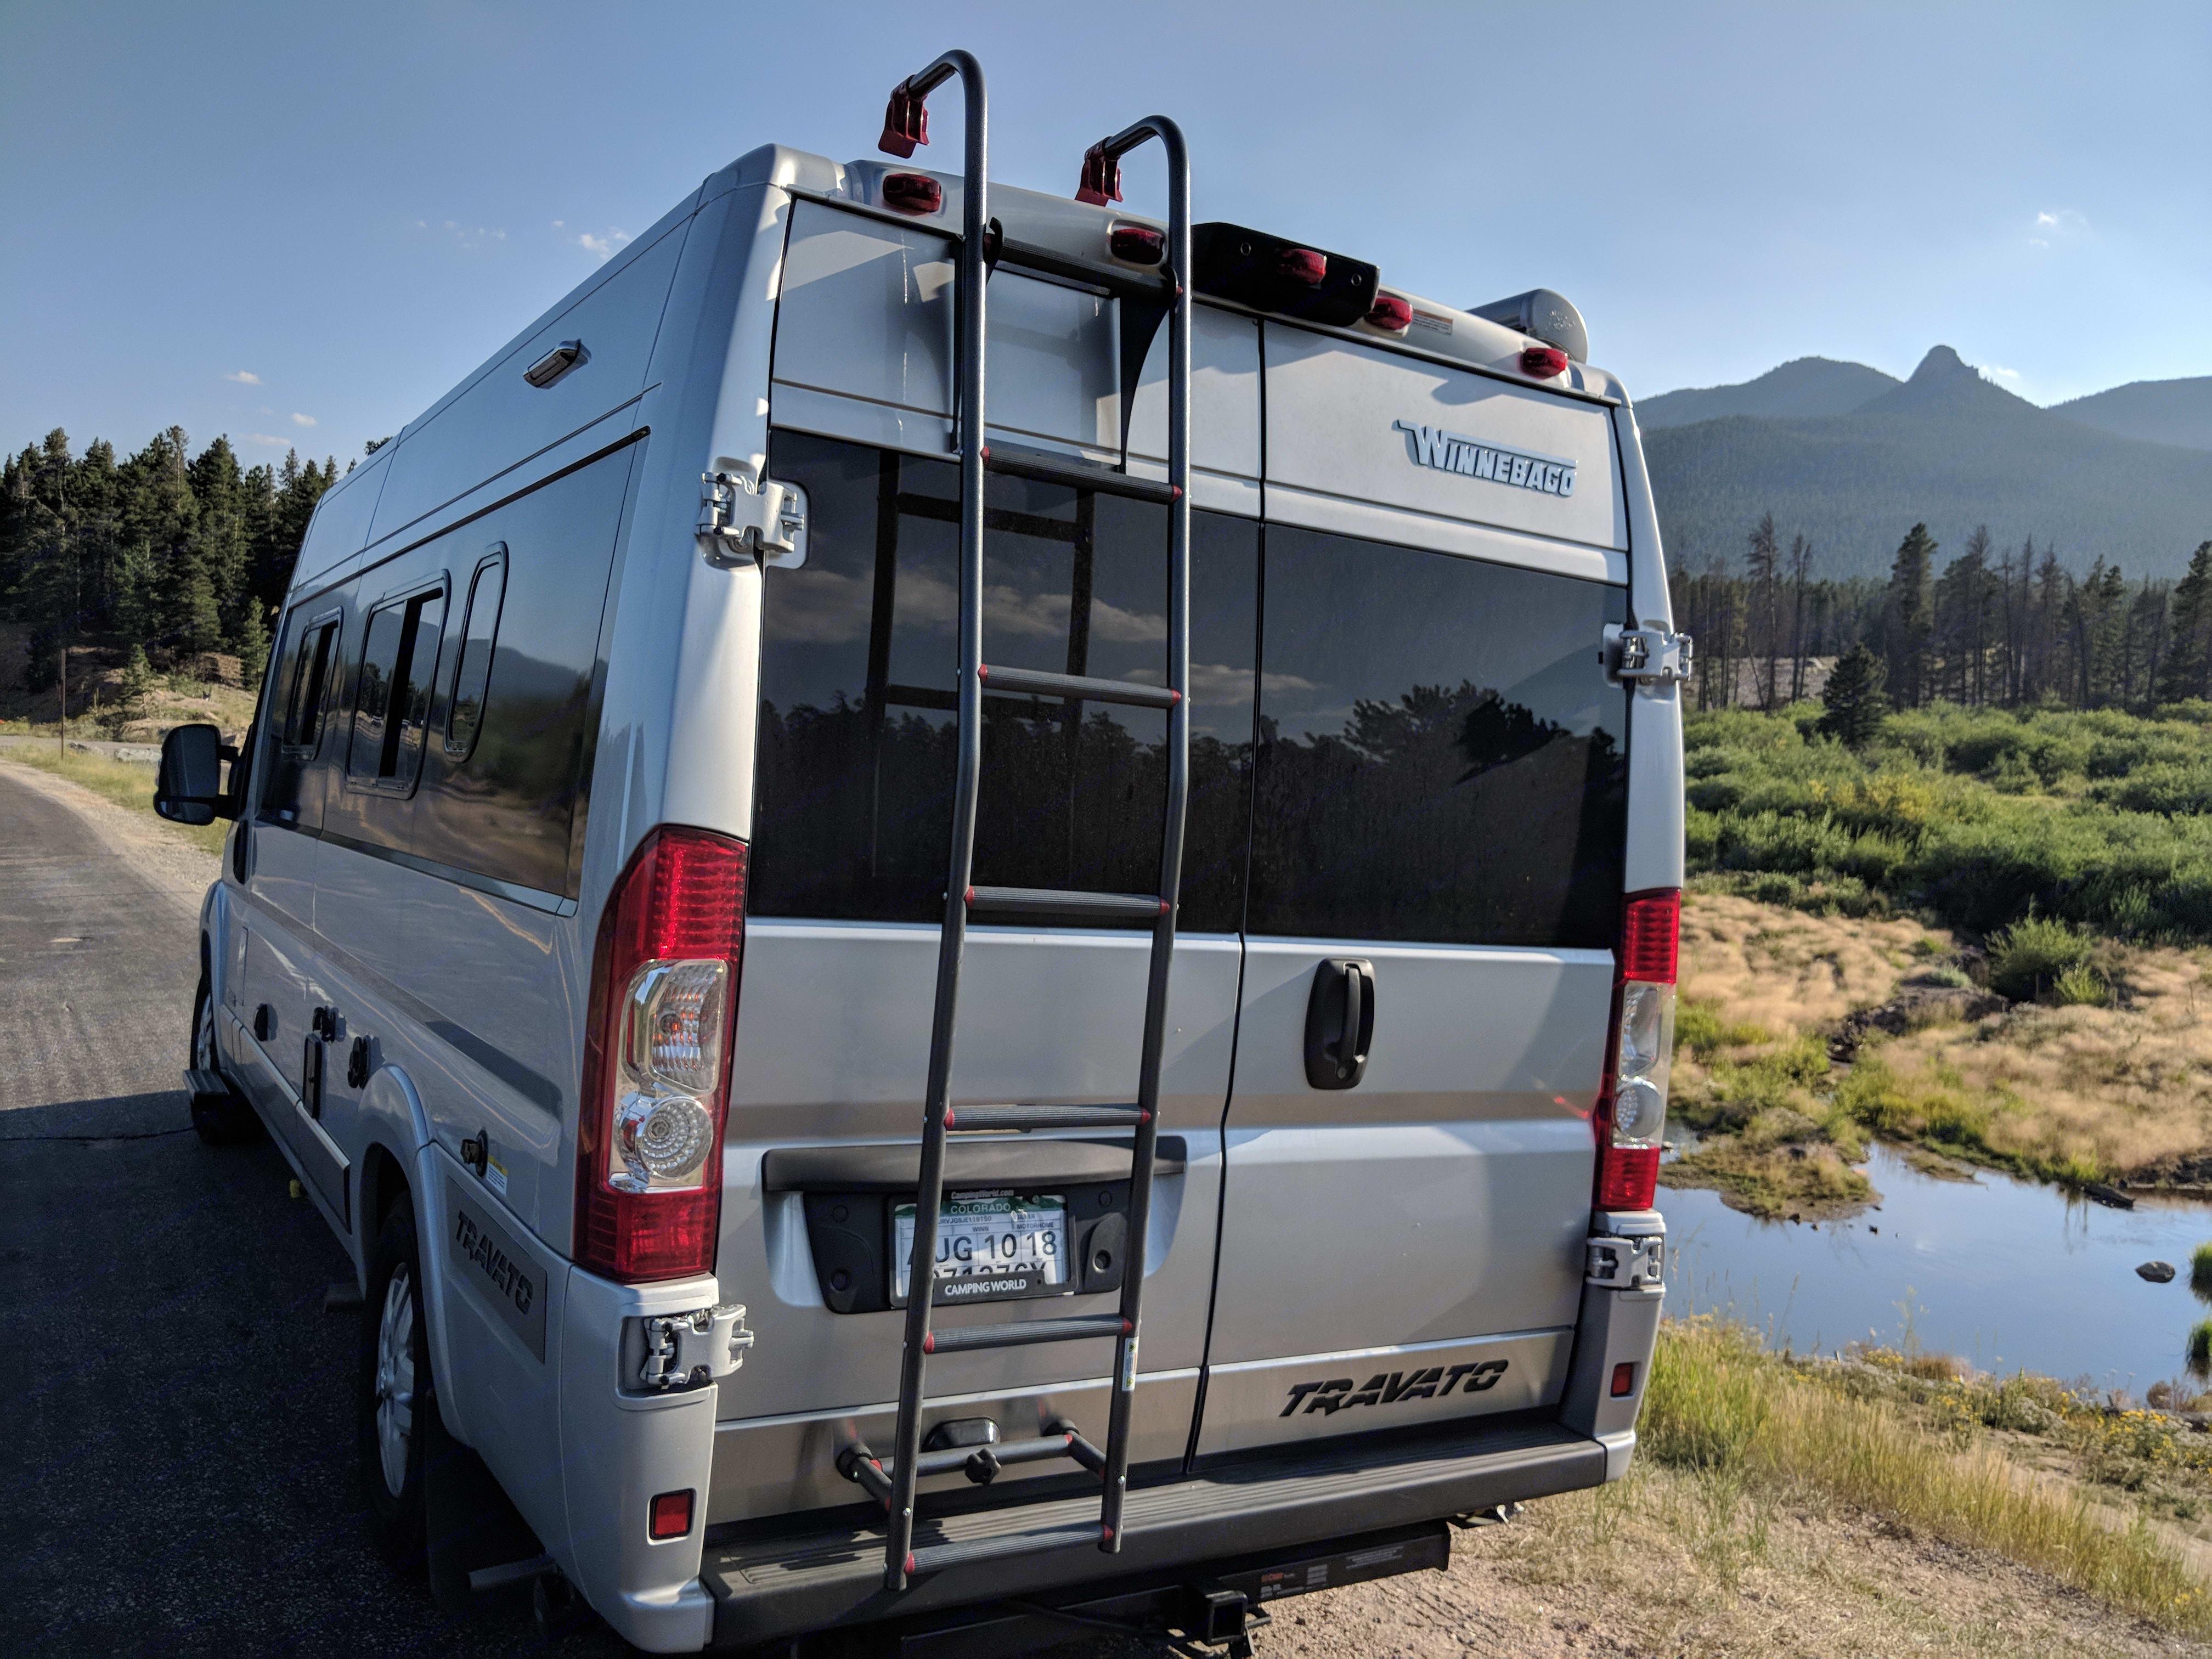 Winnebago Travato Camper Van 2019